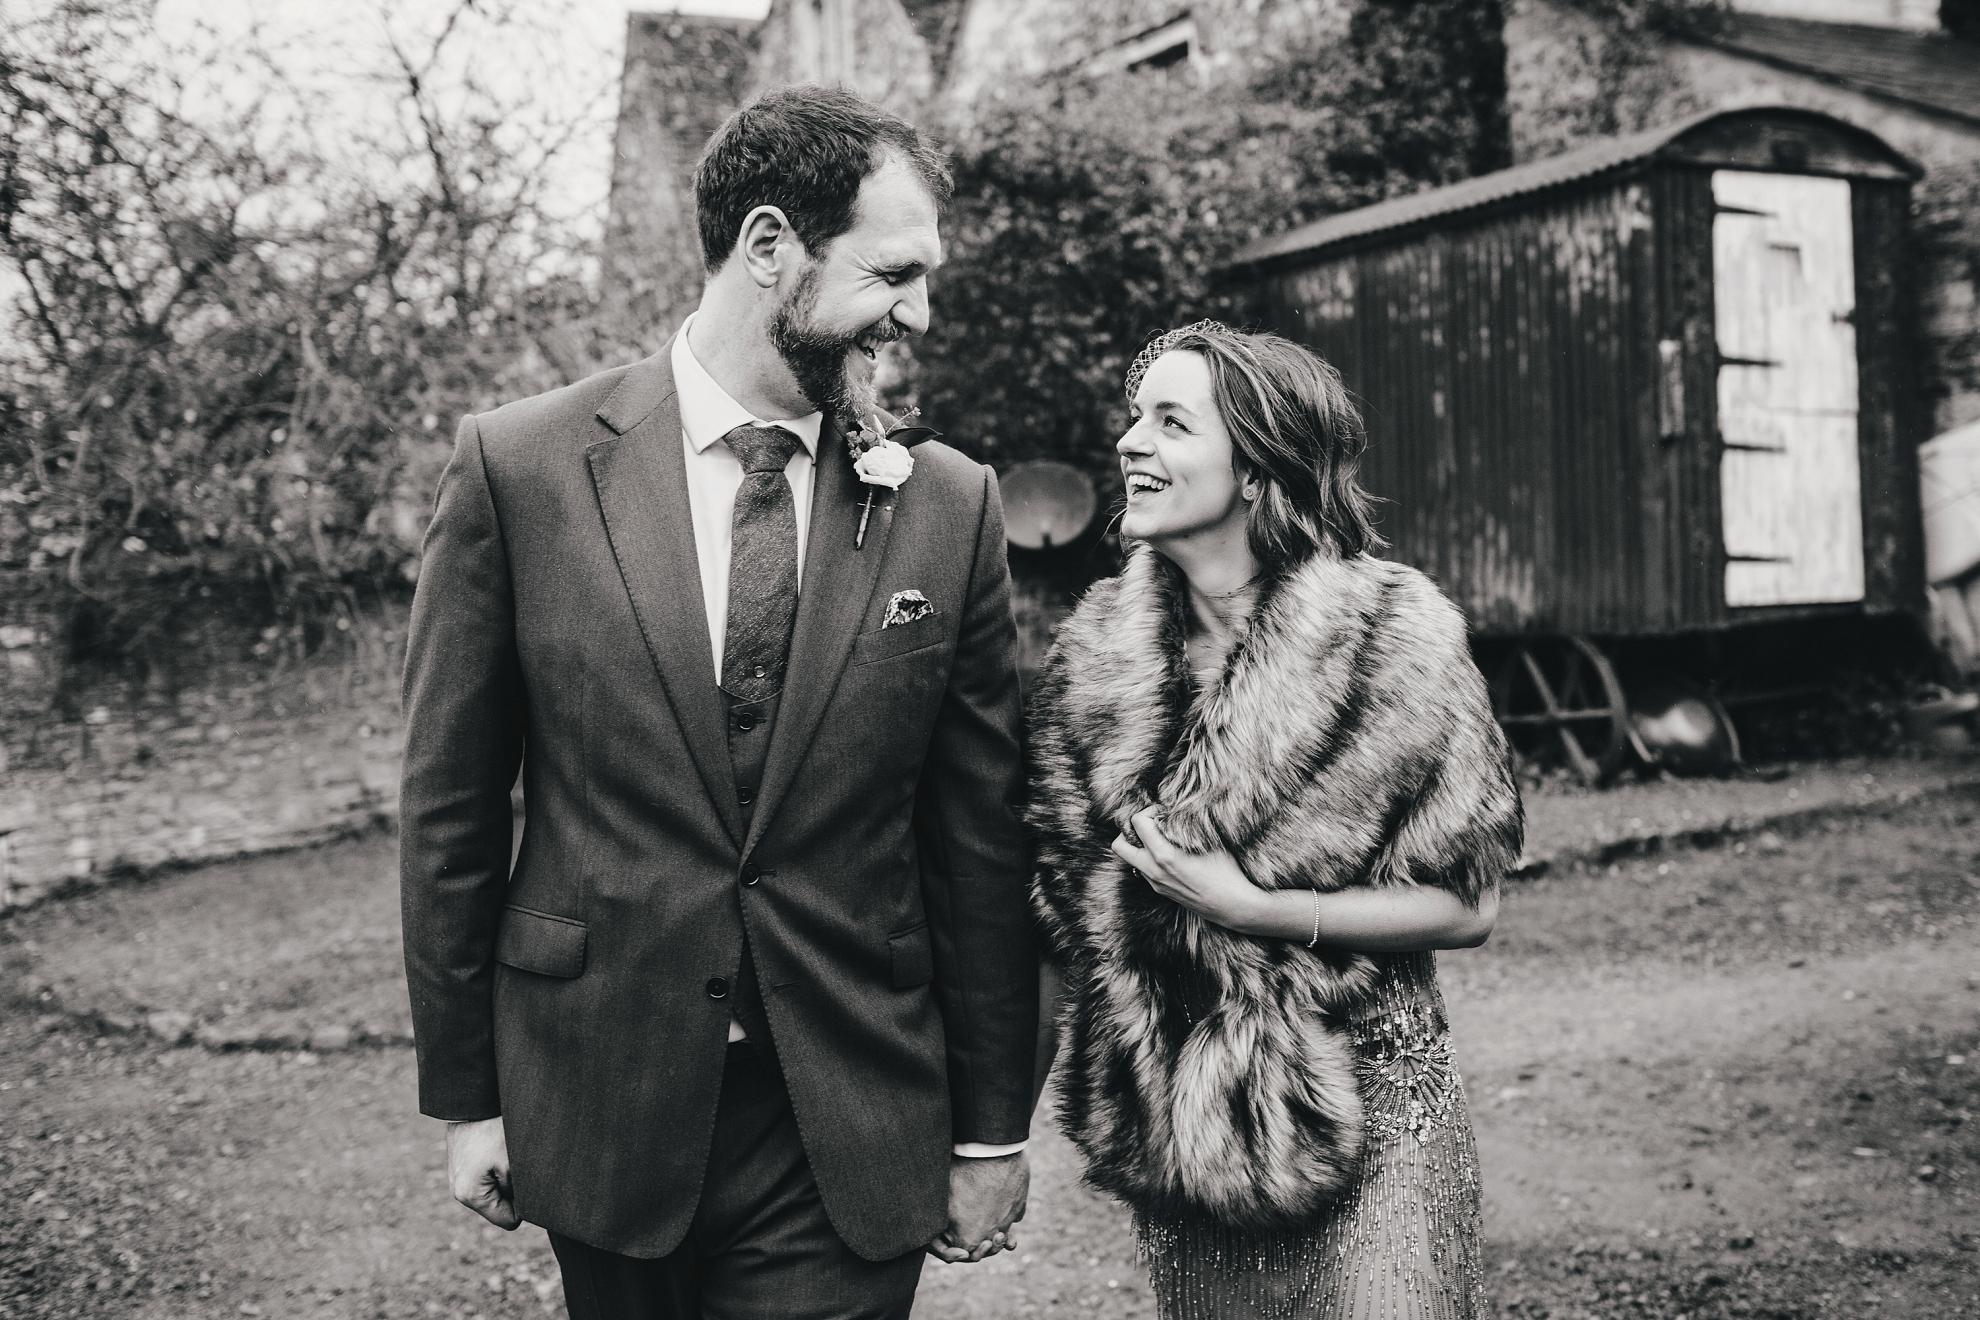 Stowford Manor Farm wedding photographer